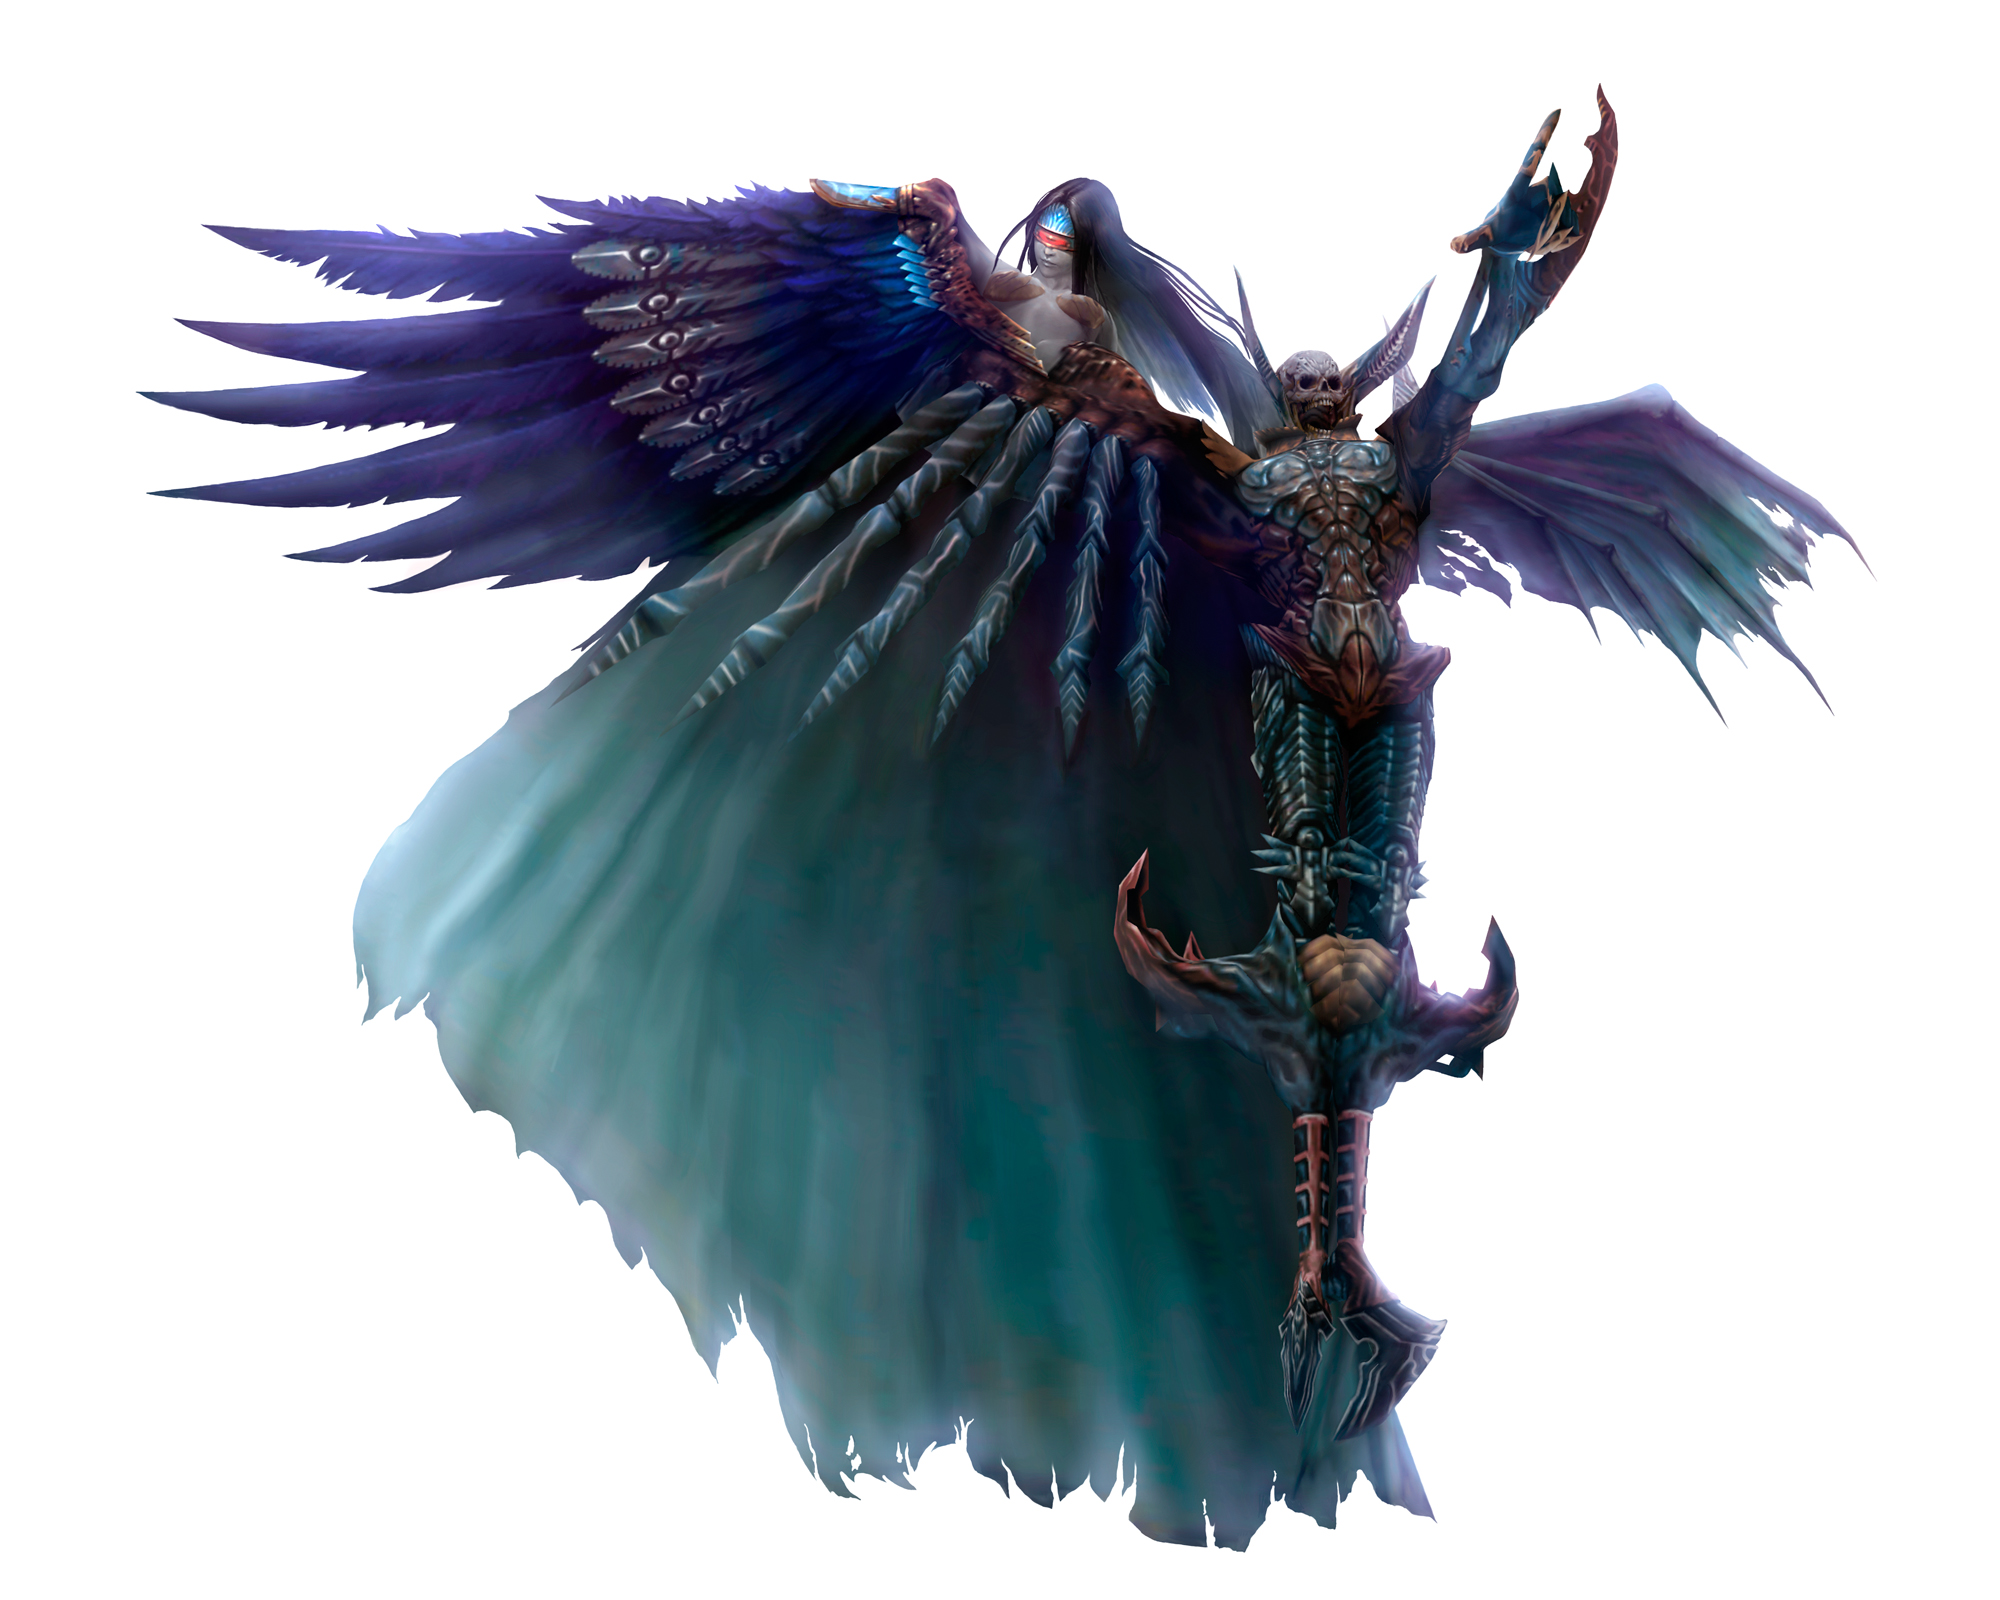 Final Fantasy XII images Final Fantasy XII Esper - Zalera HD wallpaper and background photos